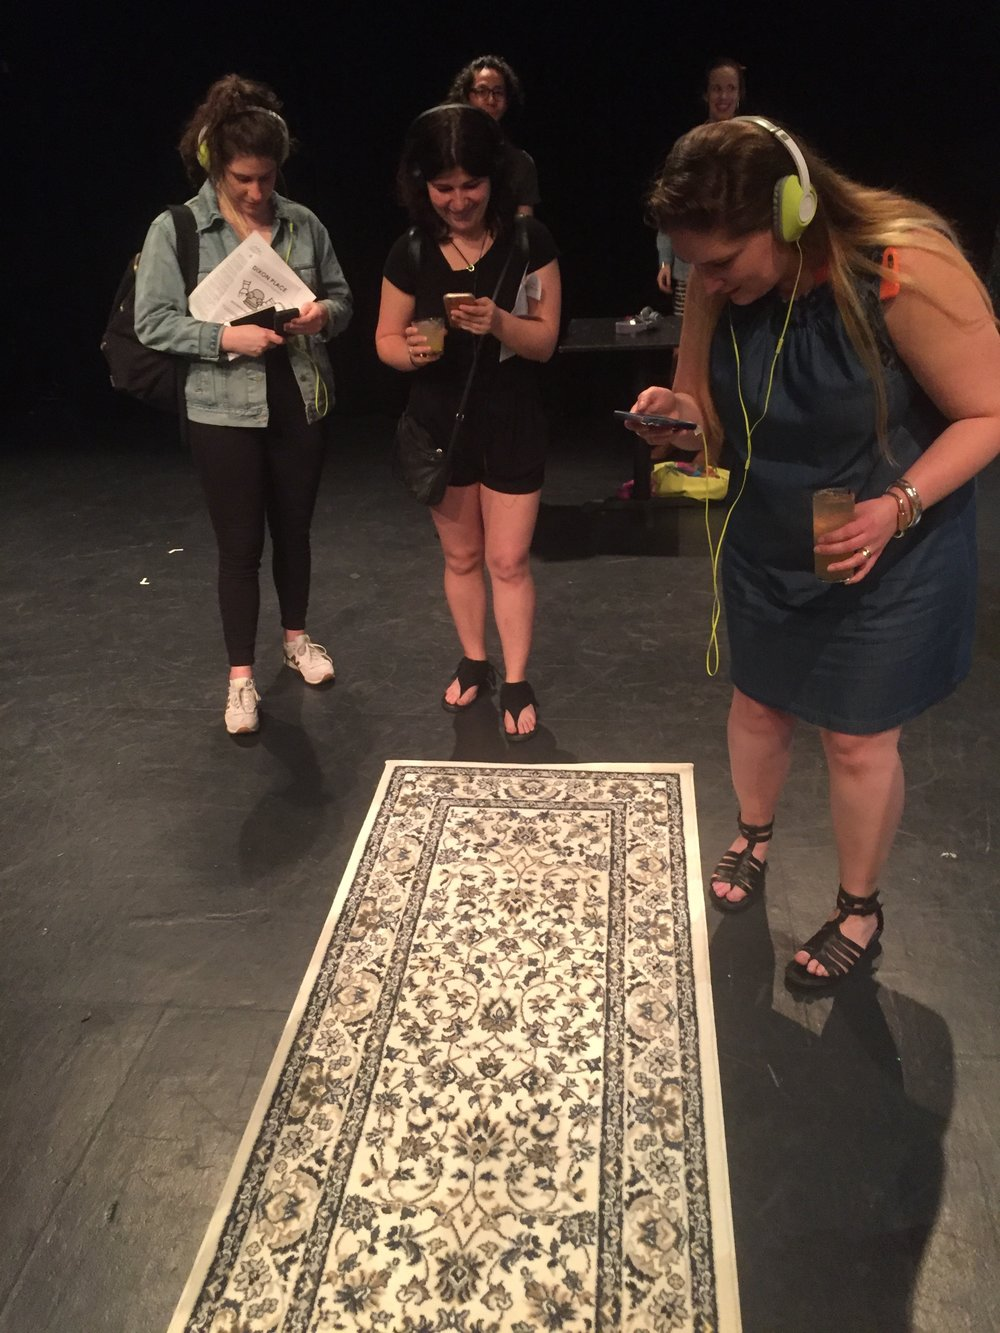 Audience members try the app